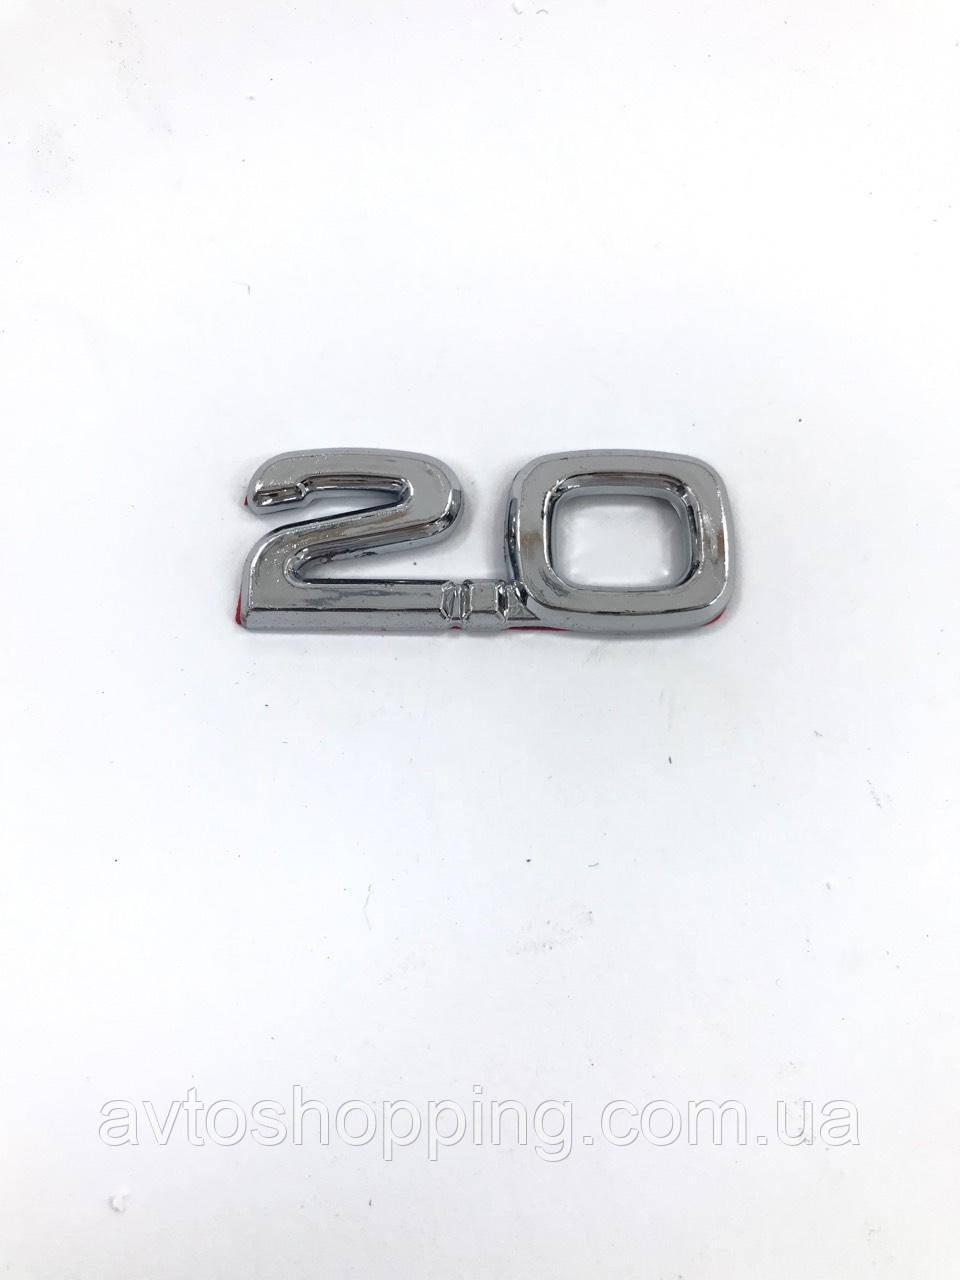 Значок эмблема на багажник надпись 2,0